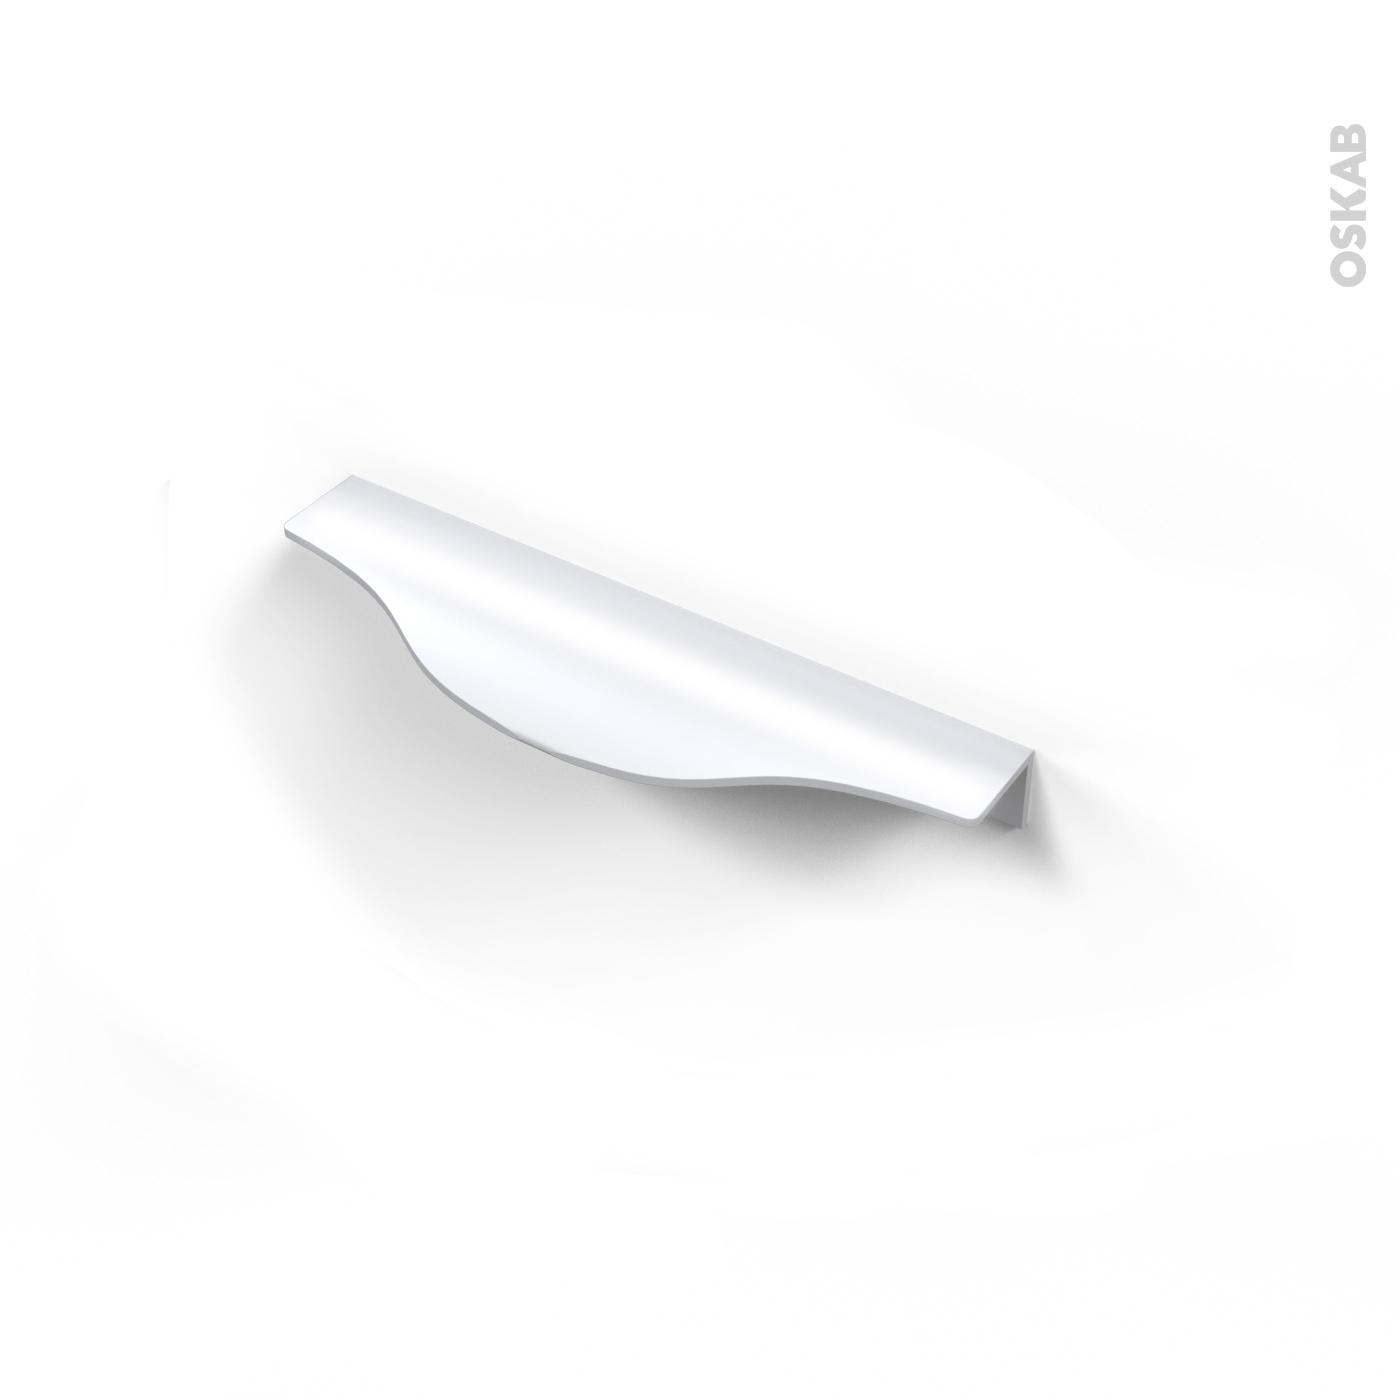 Poignee De Meuble De Cuisine N 58 Alu Mat Blanc 14 6 Cm Entraxe